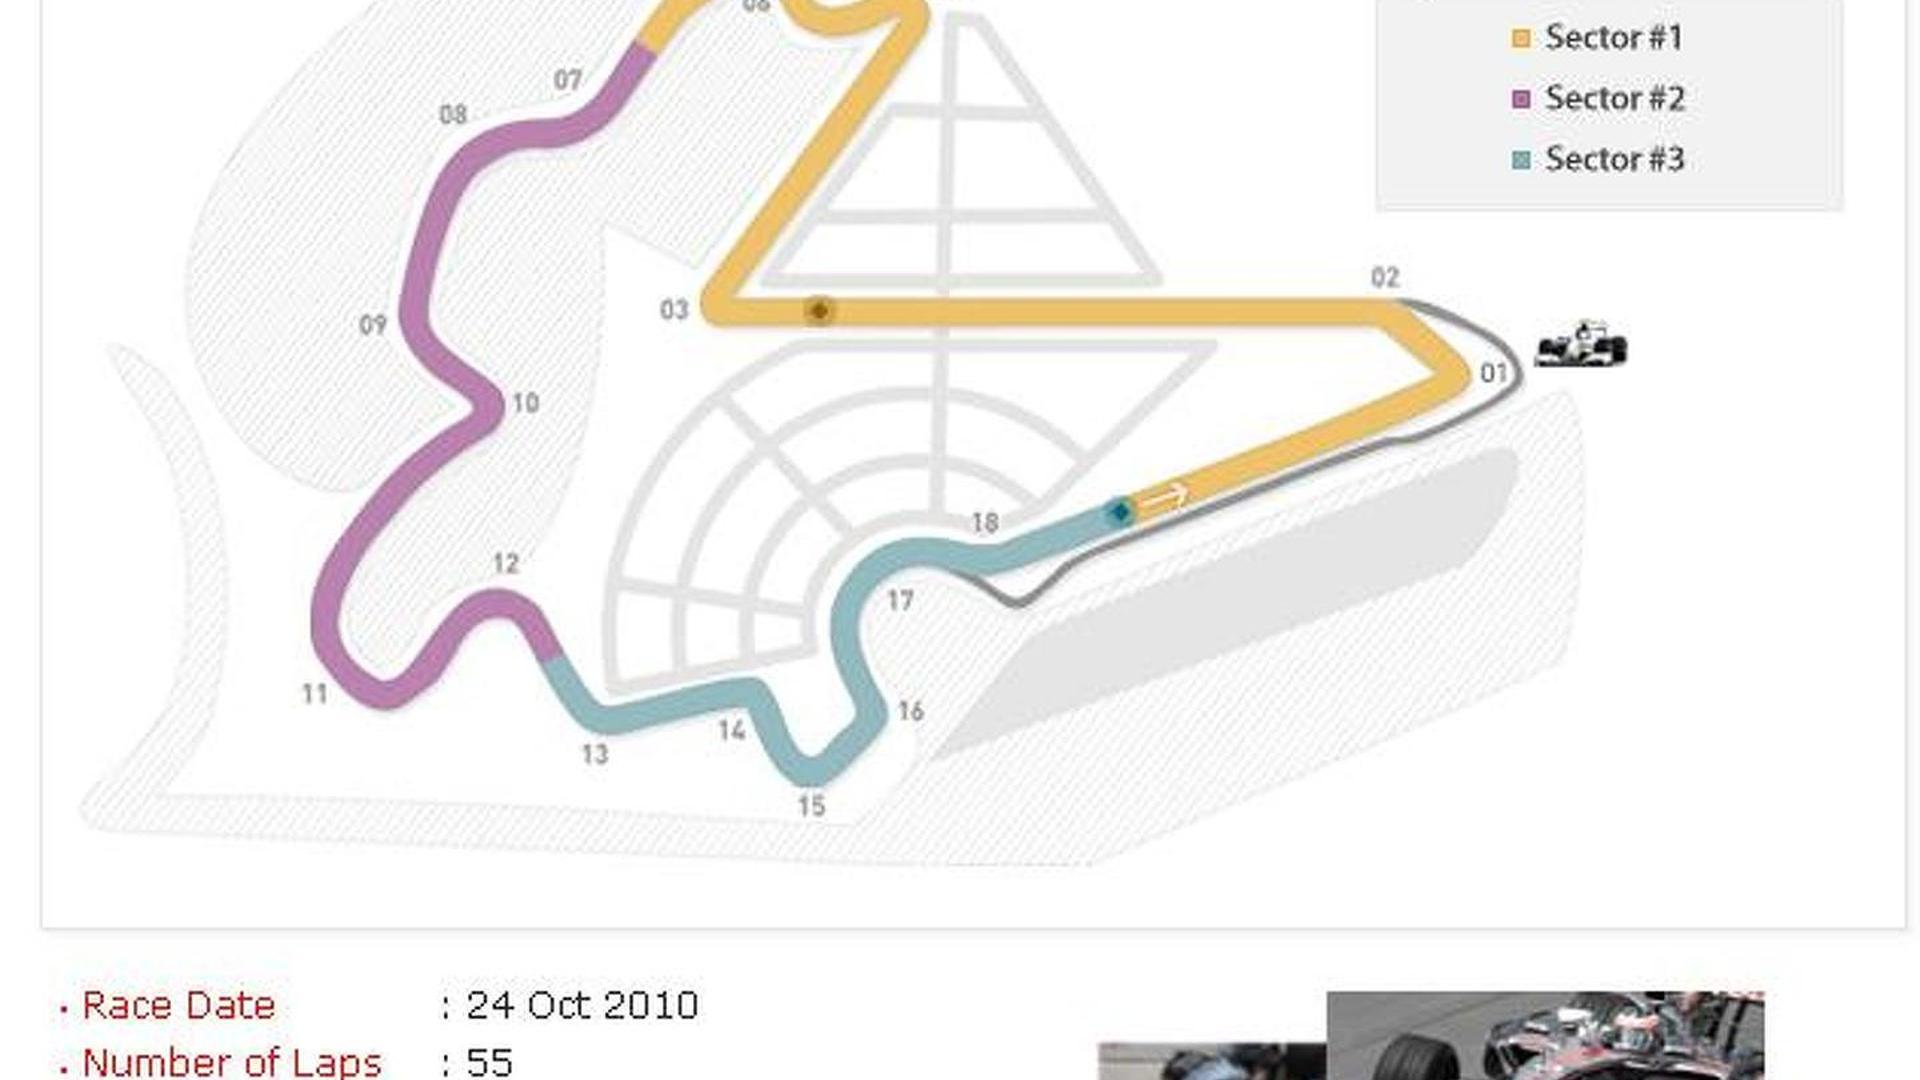 Ecclestone confident Korea will be ready for F1 race